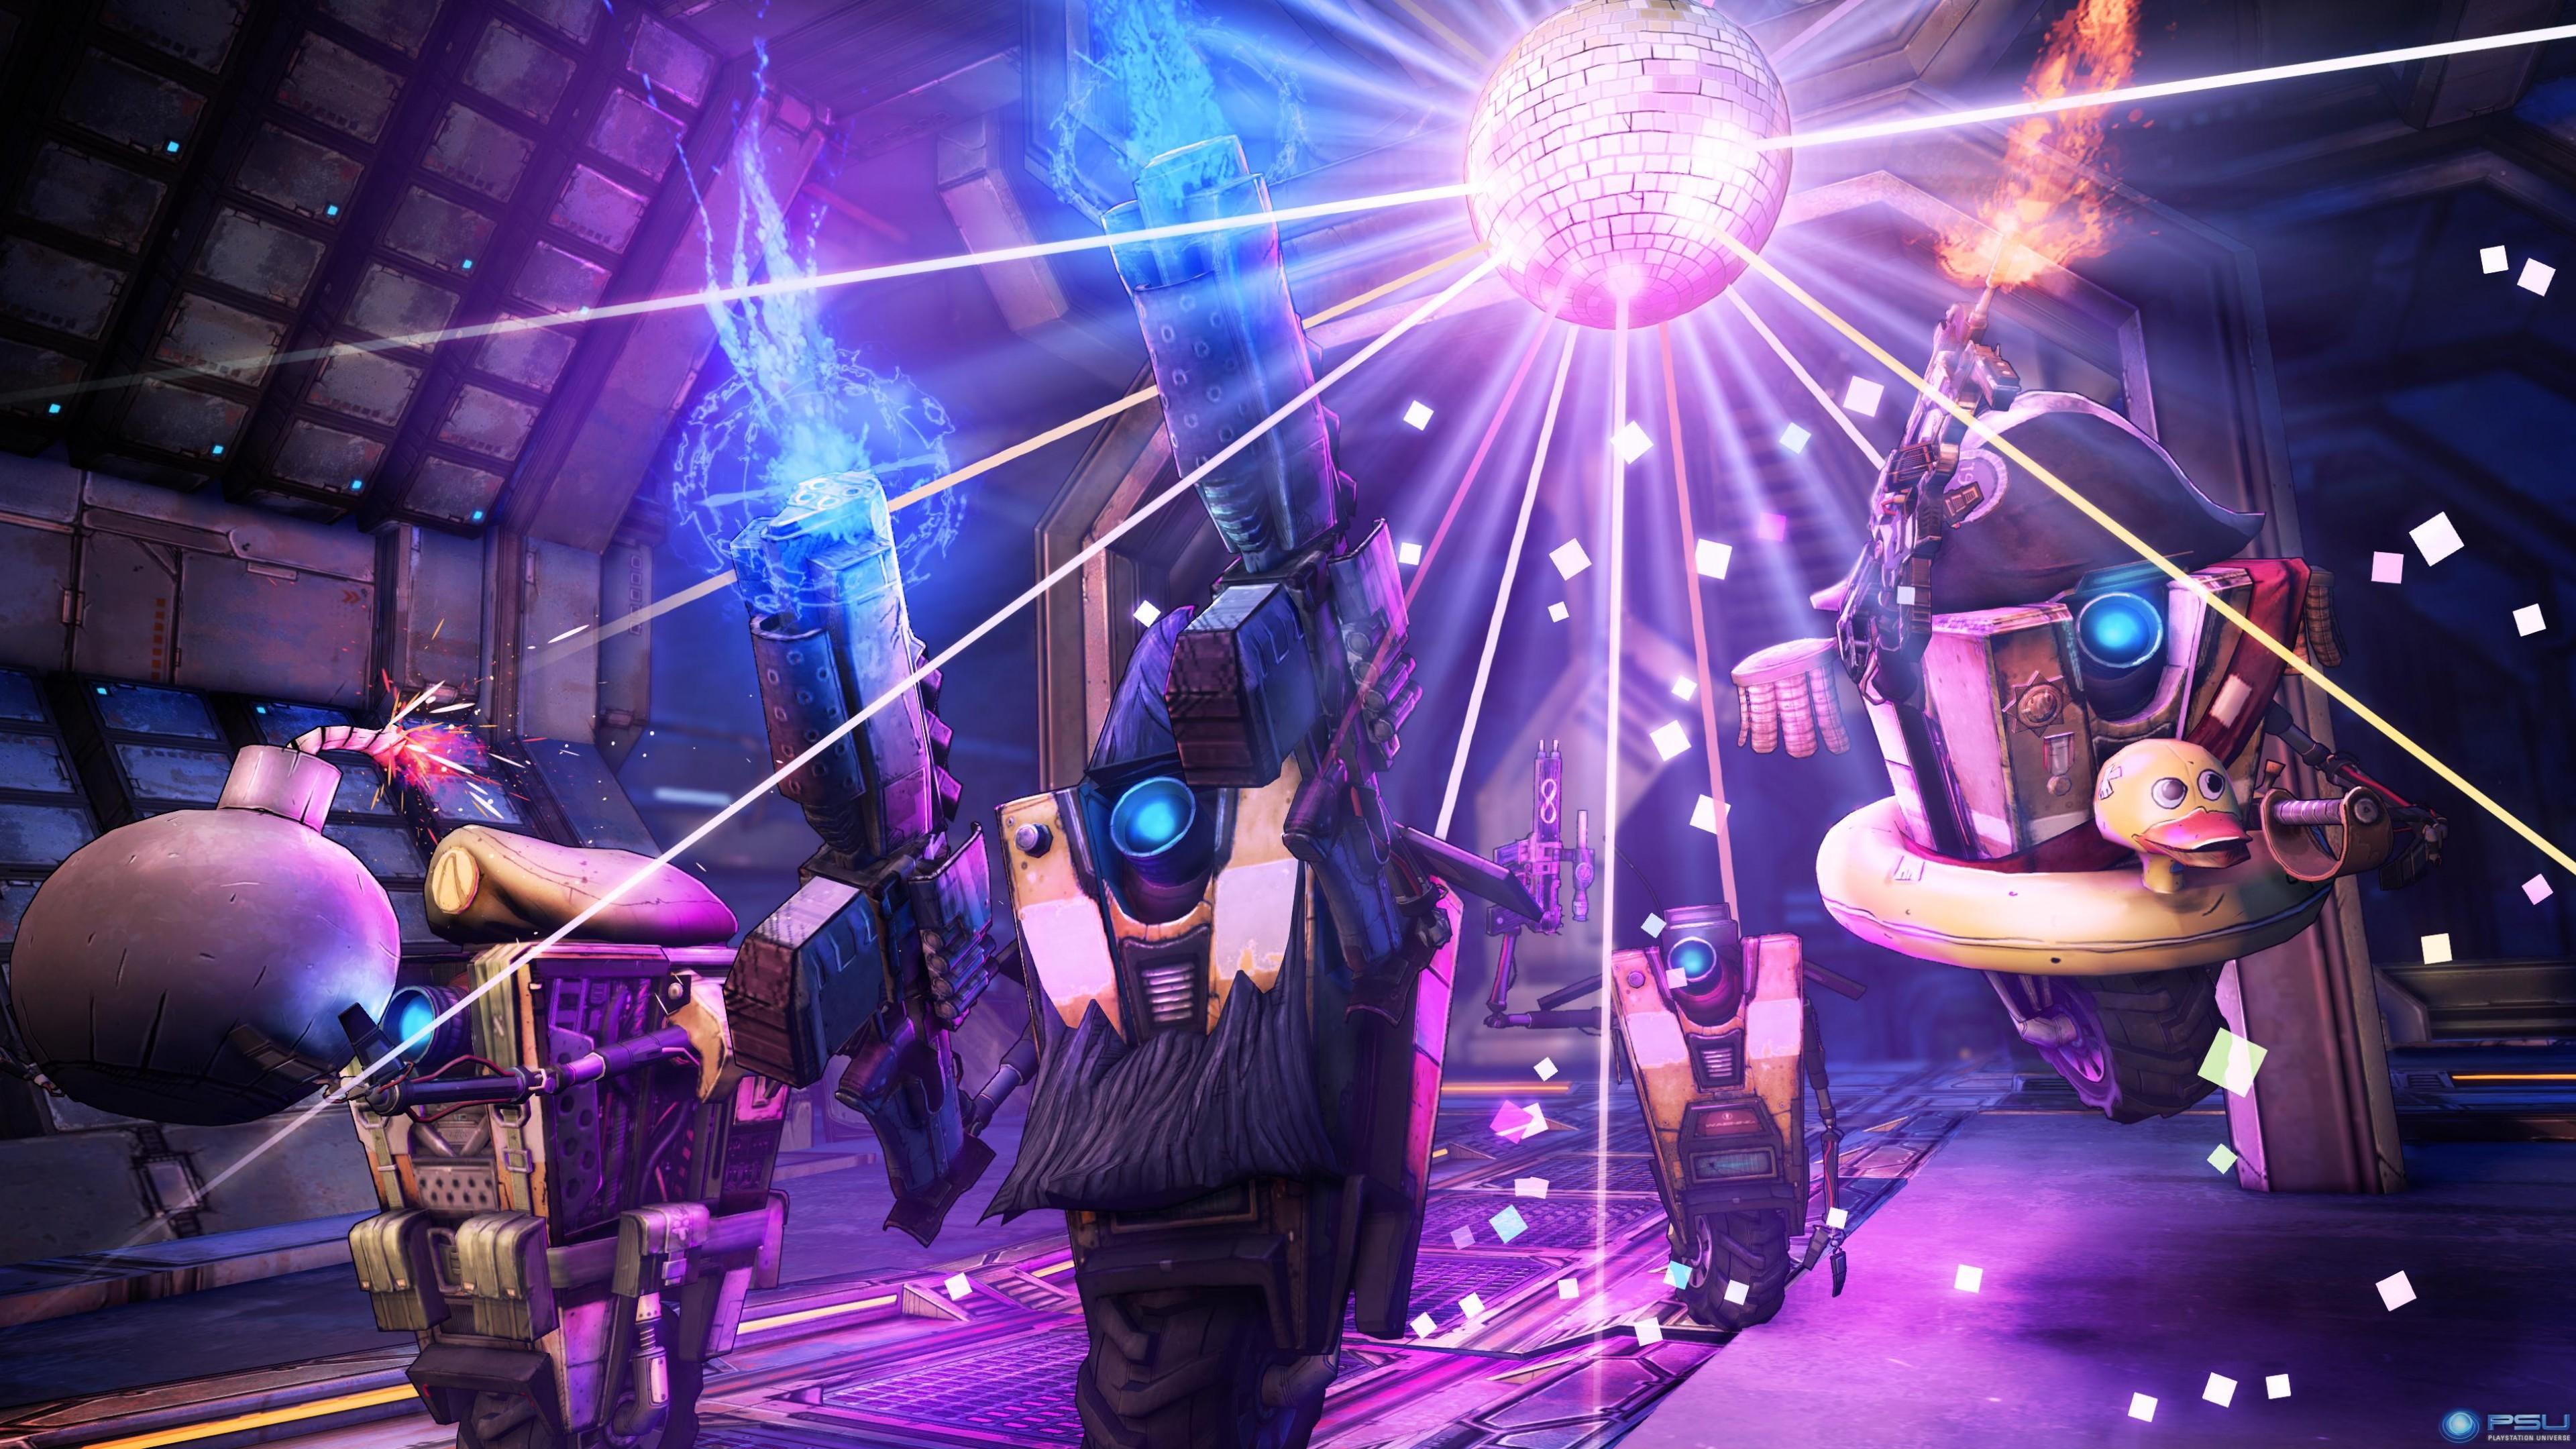 Wallpaper Borderlands The Pre Sequel Best Games 2015 Game